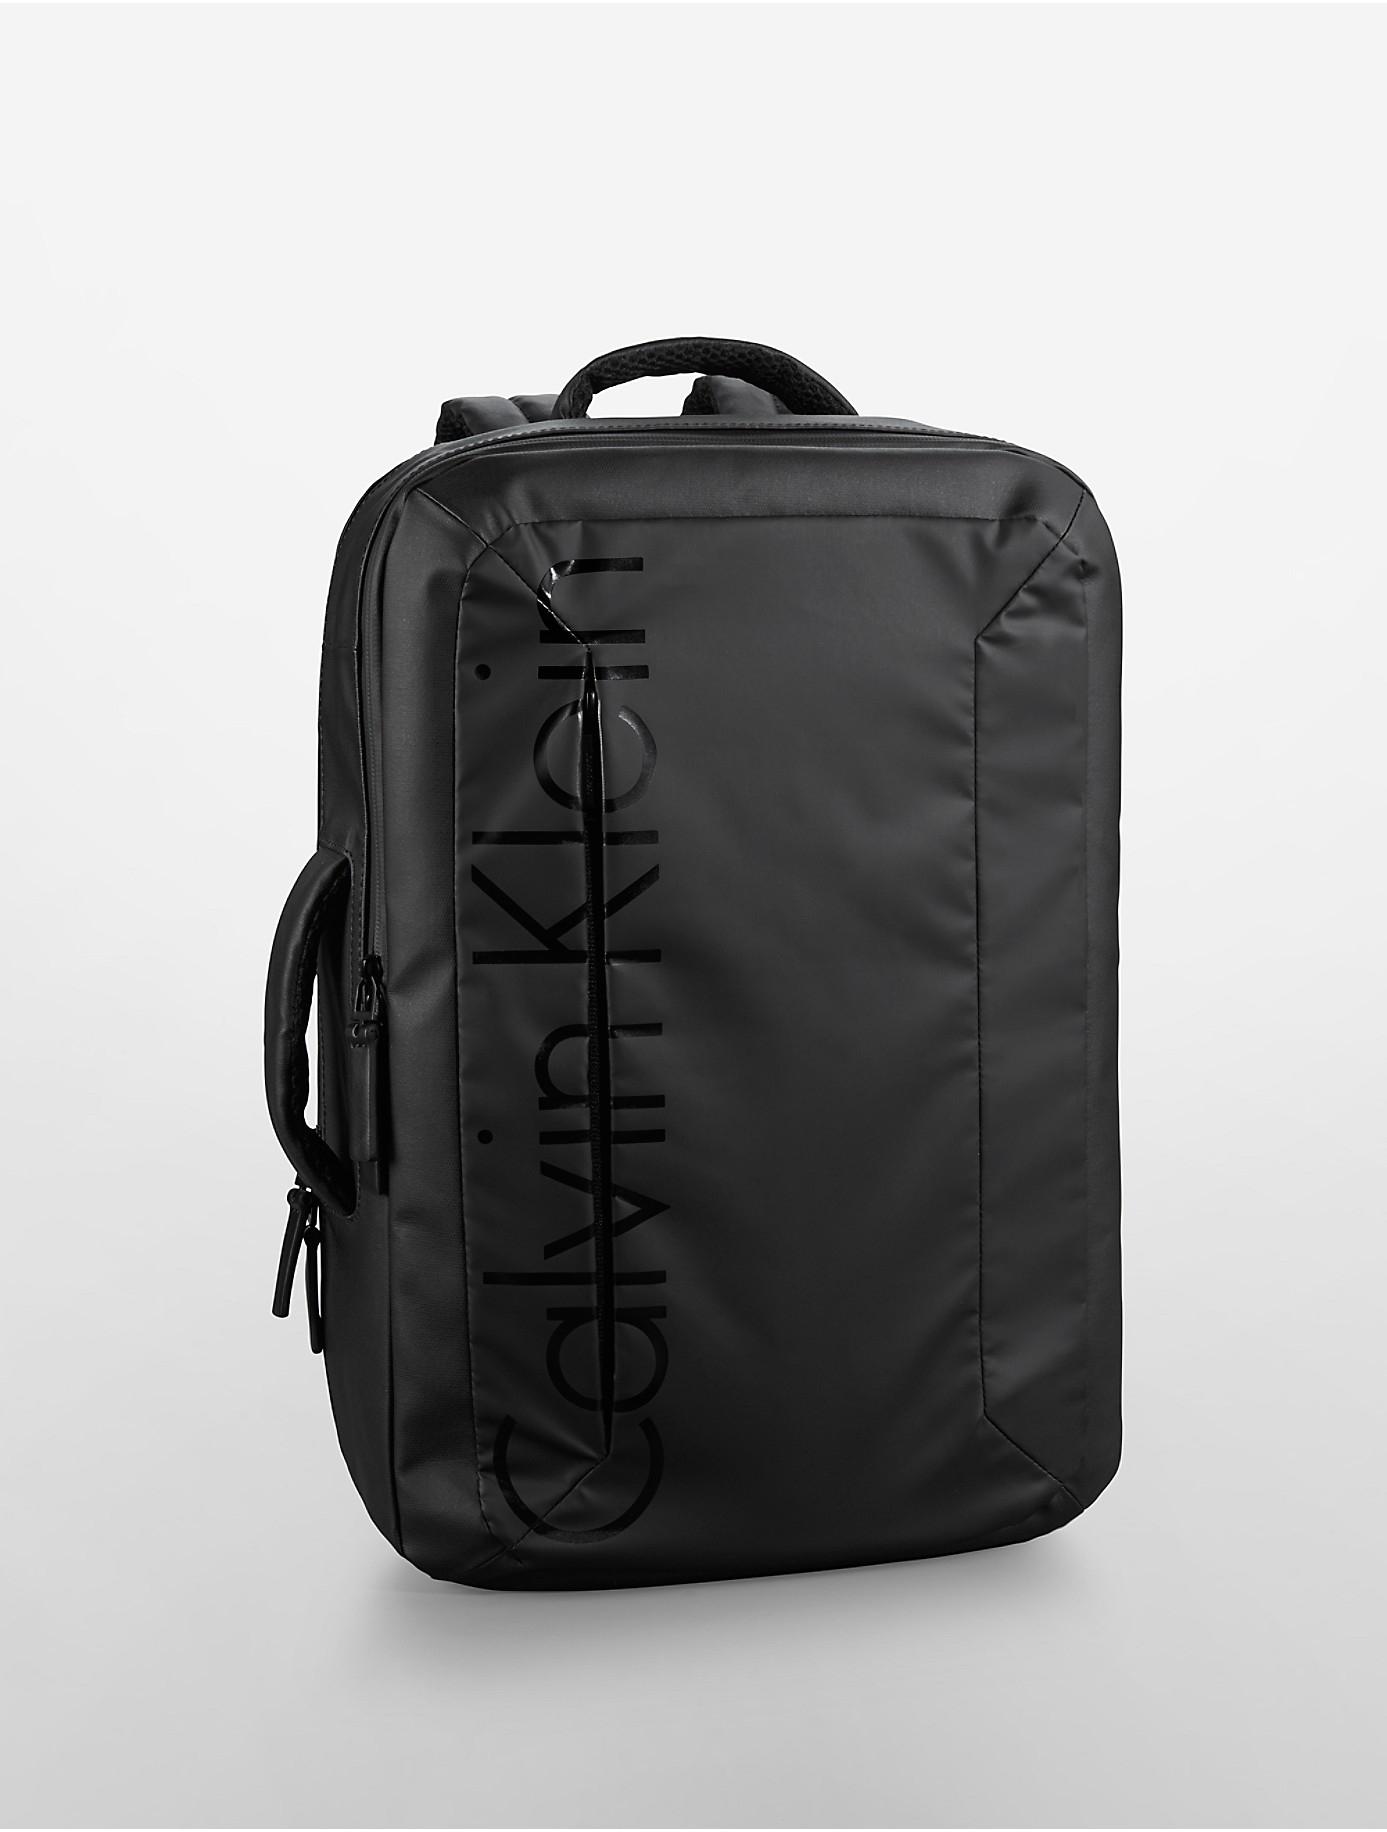 calvin klein jeans logan convertible backpack in black for men lyst. Black Bedroom Furniture Sets. Home Design Ideas